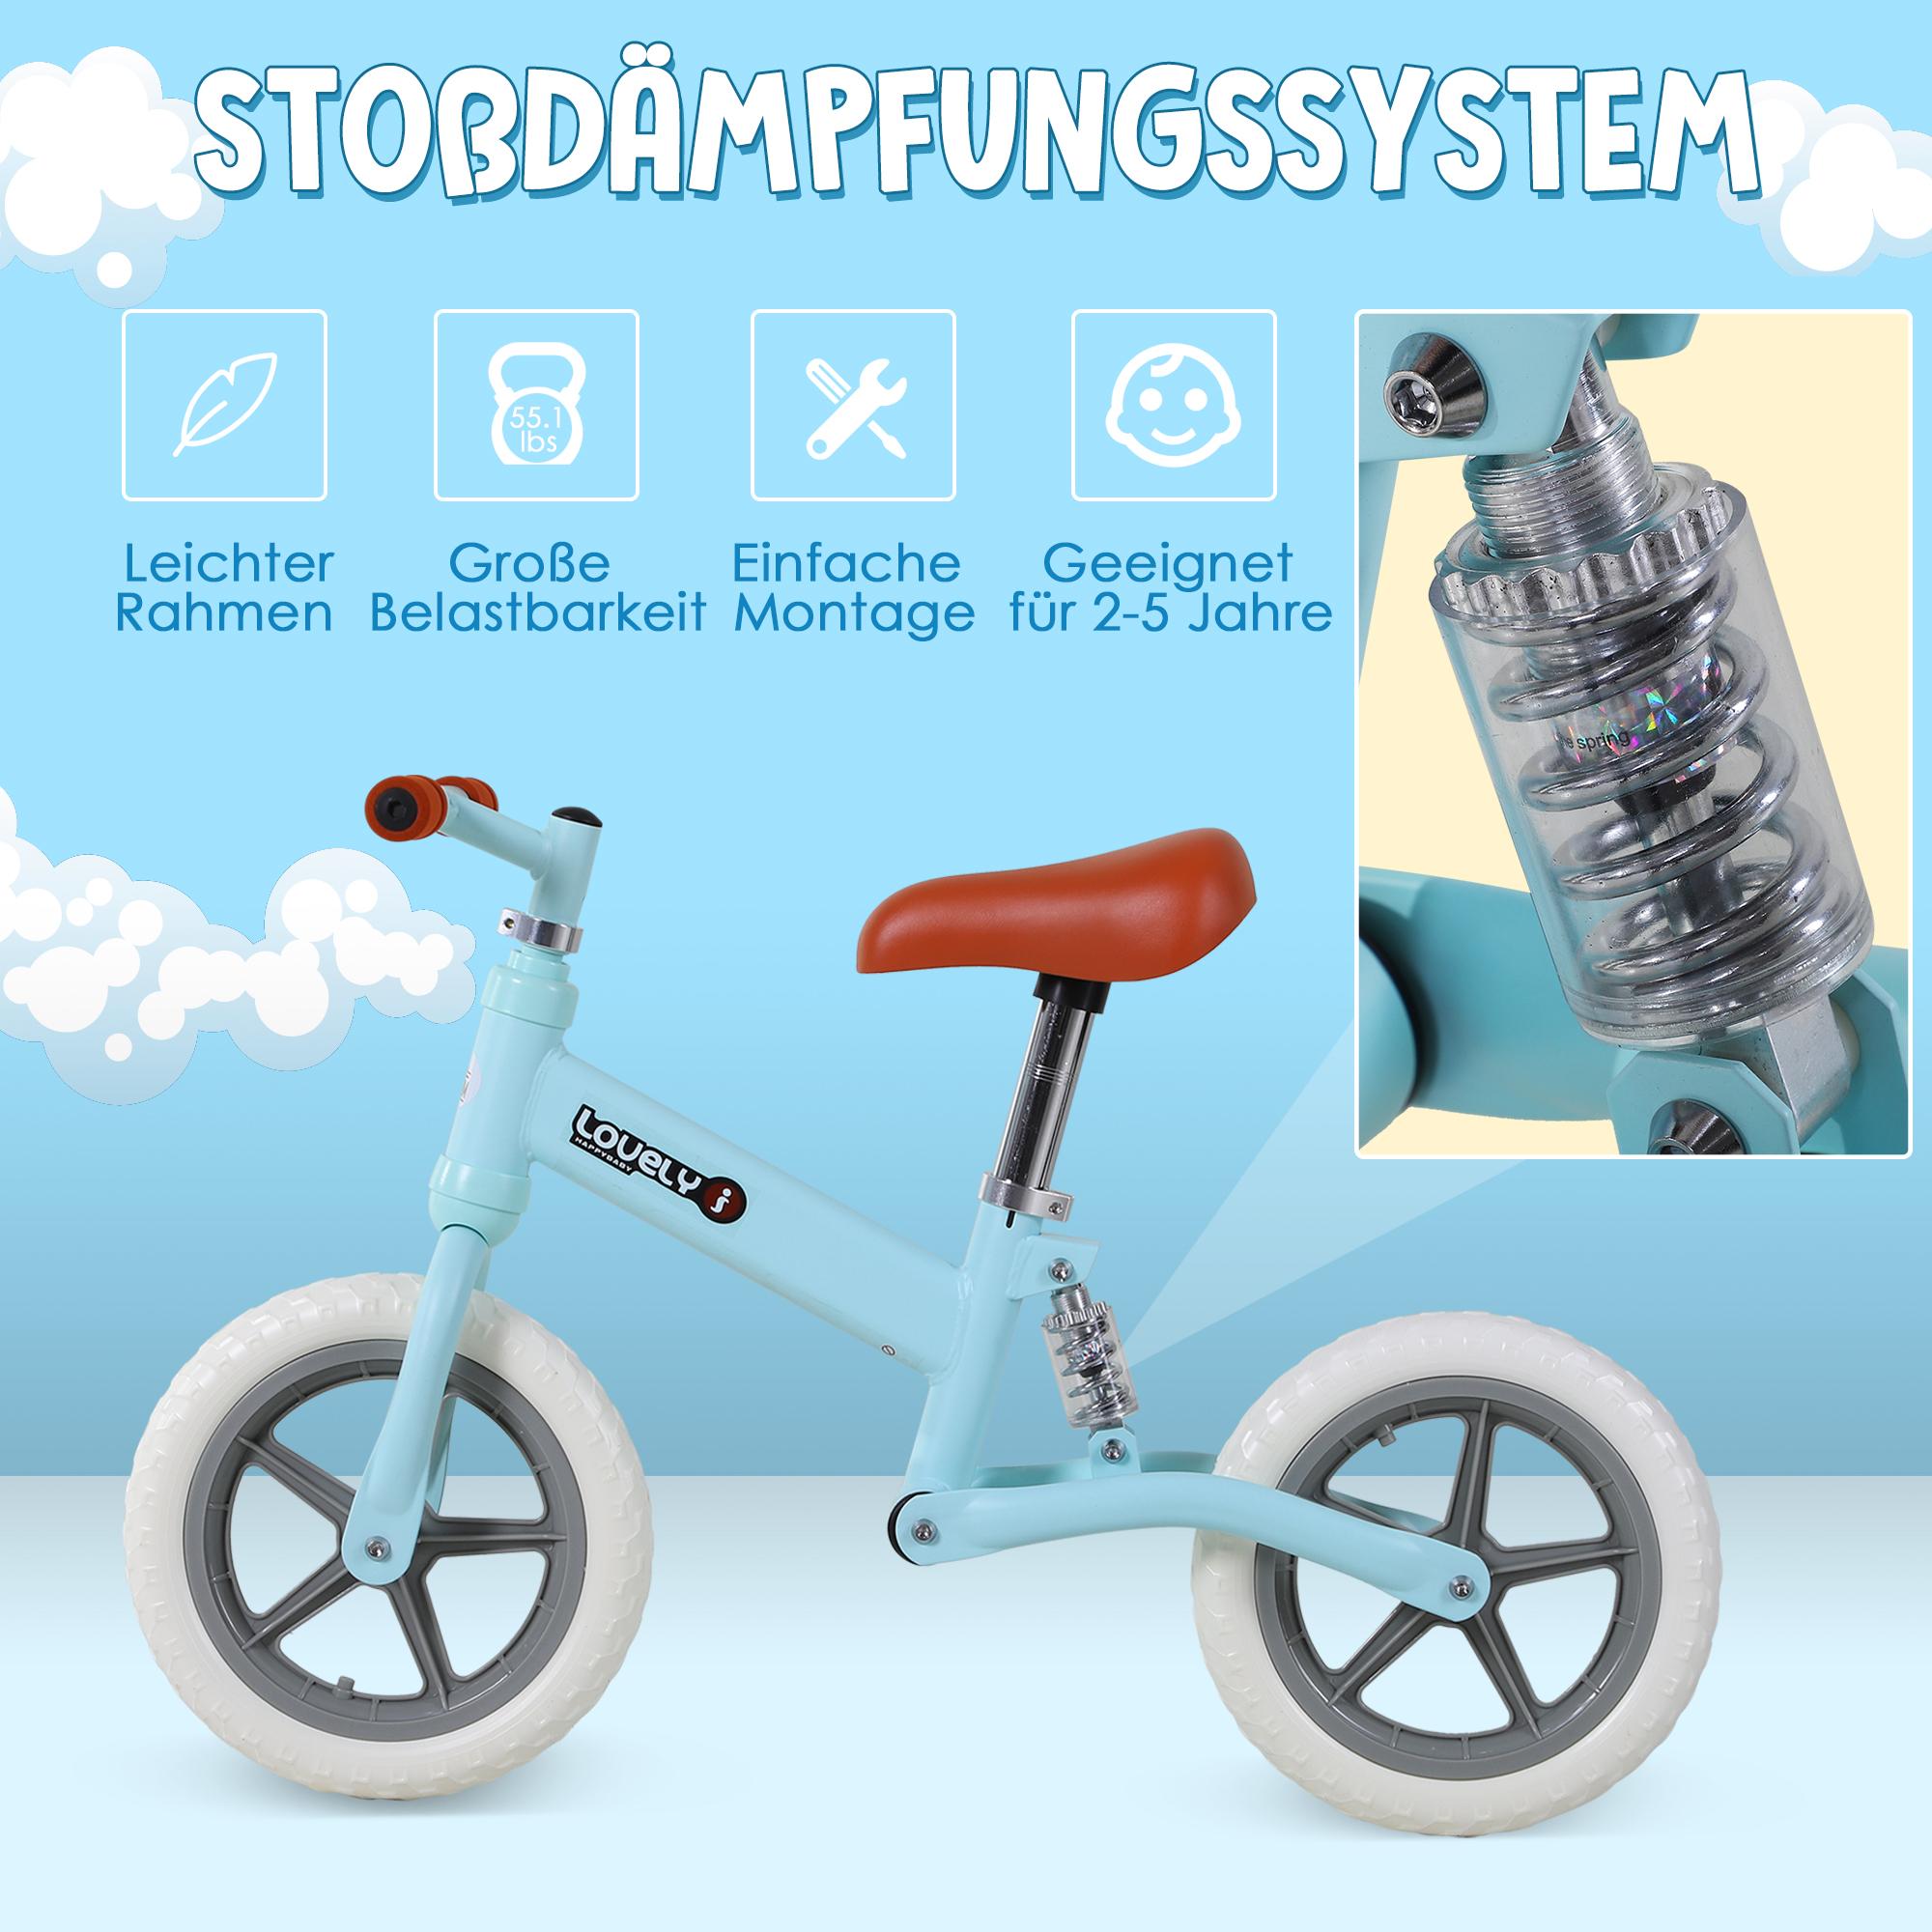 Indexbild 11 - HOMCOM Laufrad mit Stoßdämpfer Kinderrad Lauflernrad Balance Bike 2-5 Jahre